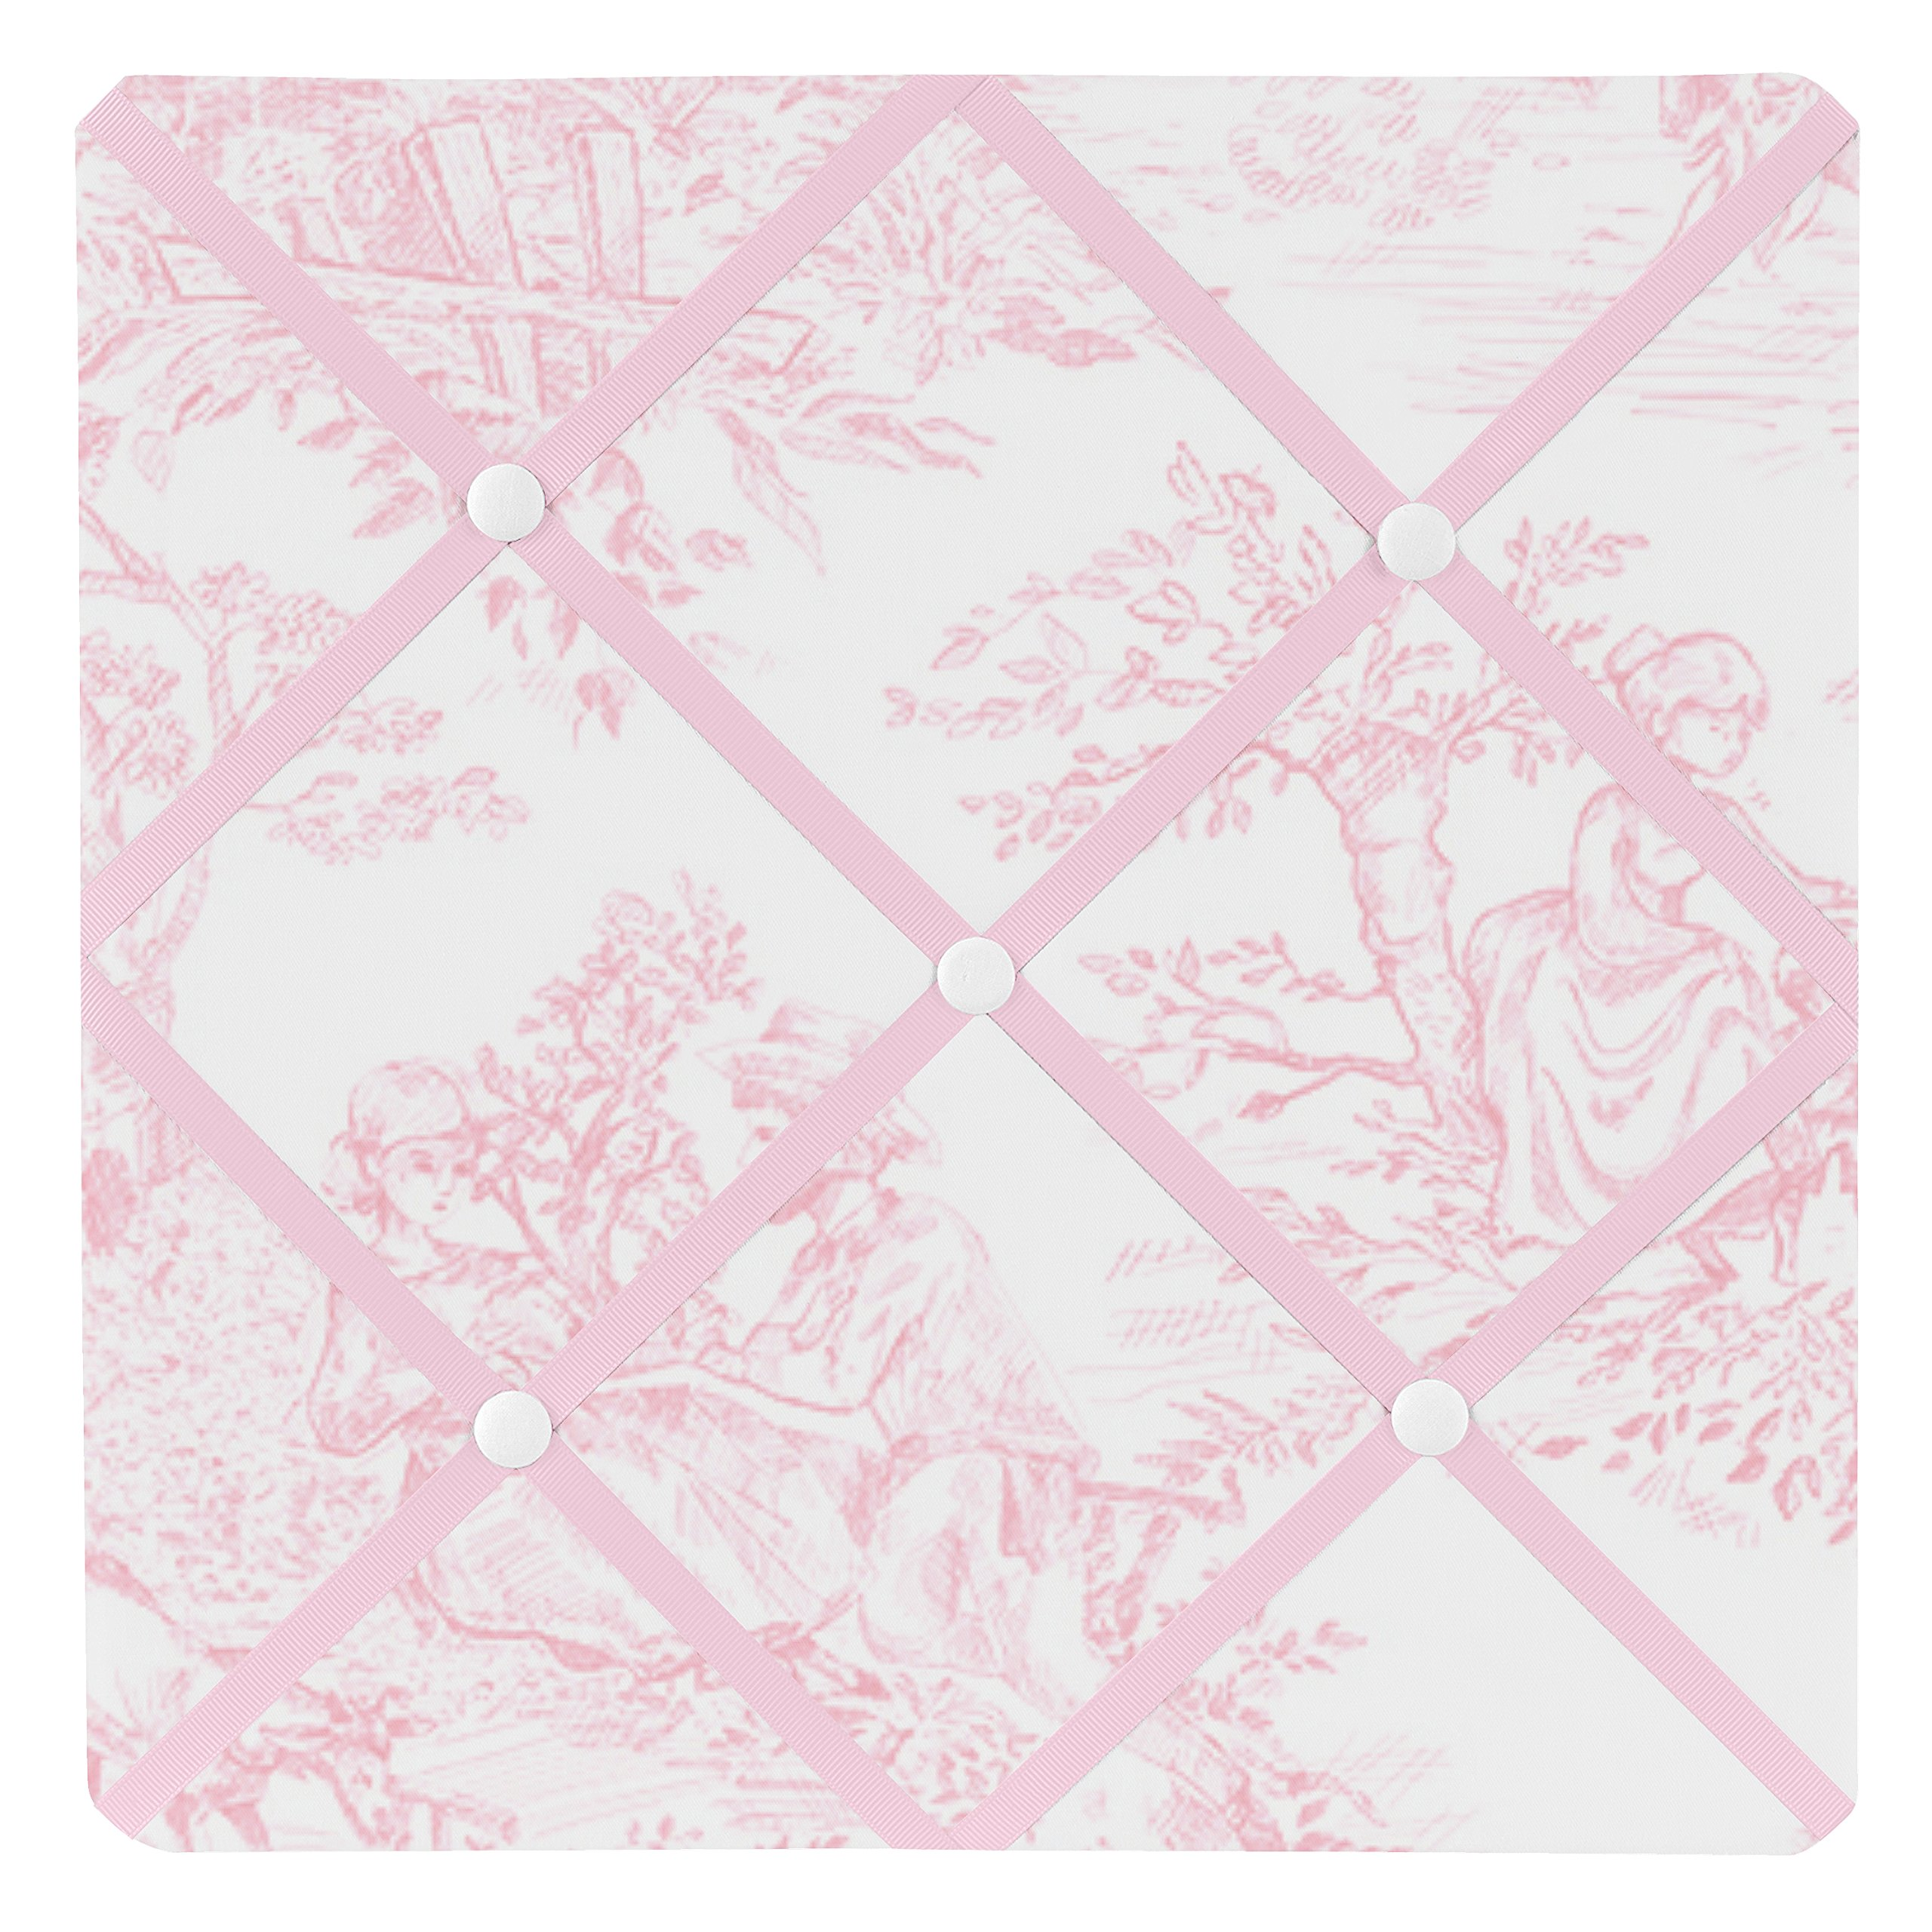 Sweet Jojo Designs Pink French Toile Fabric Memory/Memo Photo Bulletin Board